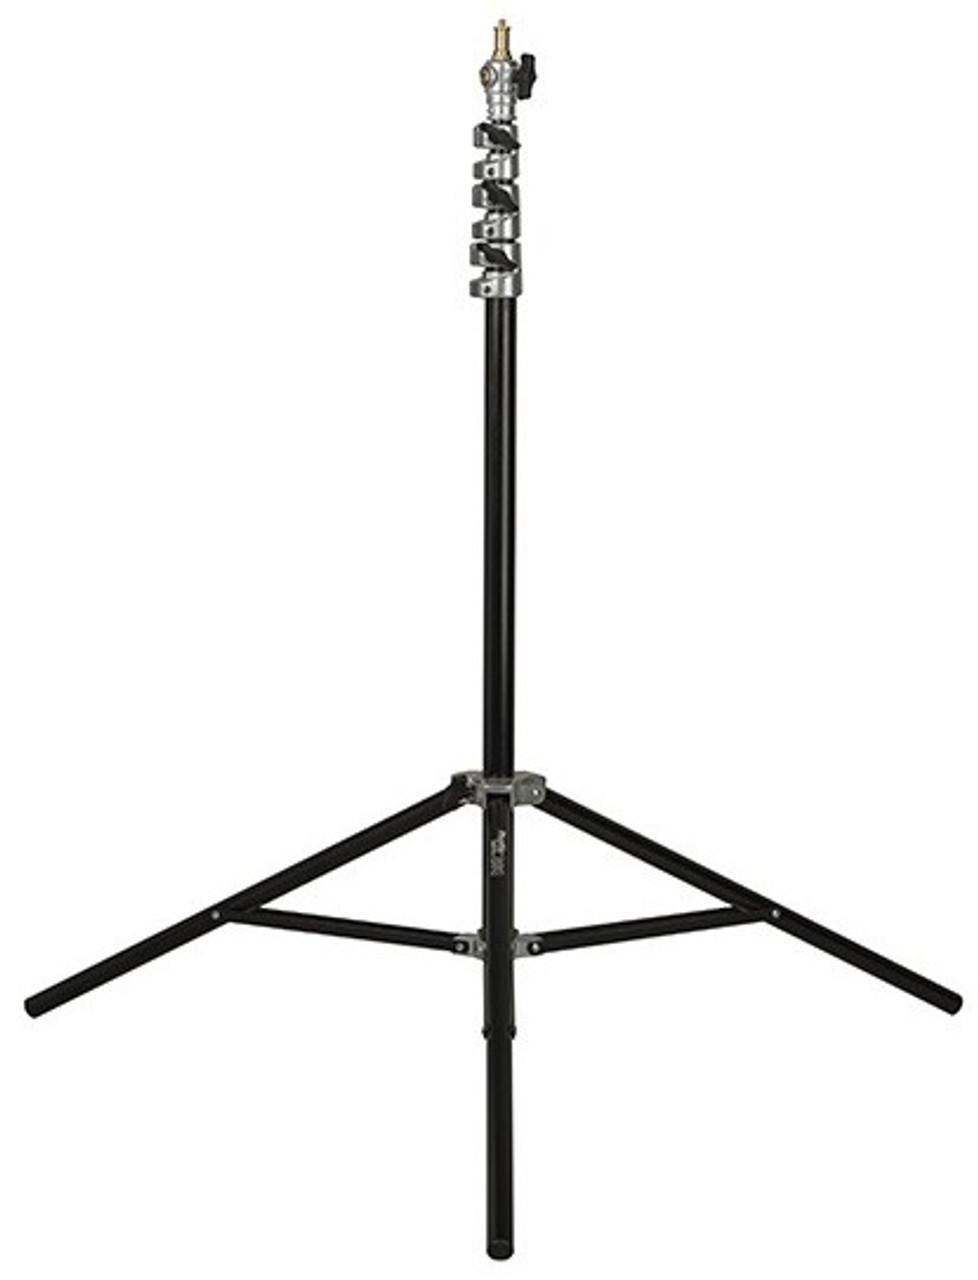 Phottix Saldo 280 Air Cushion Light Stand - 280cm